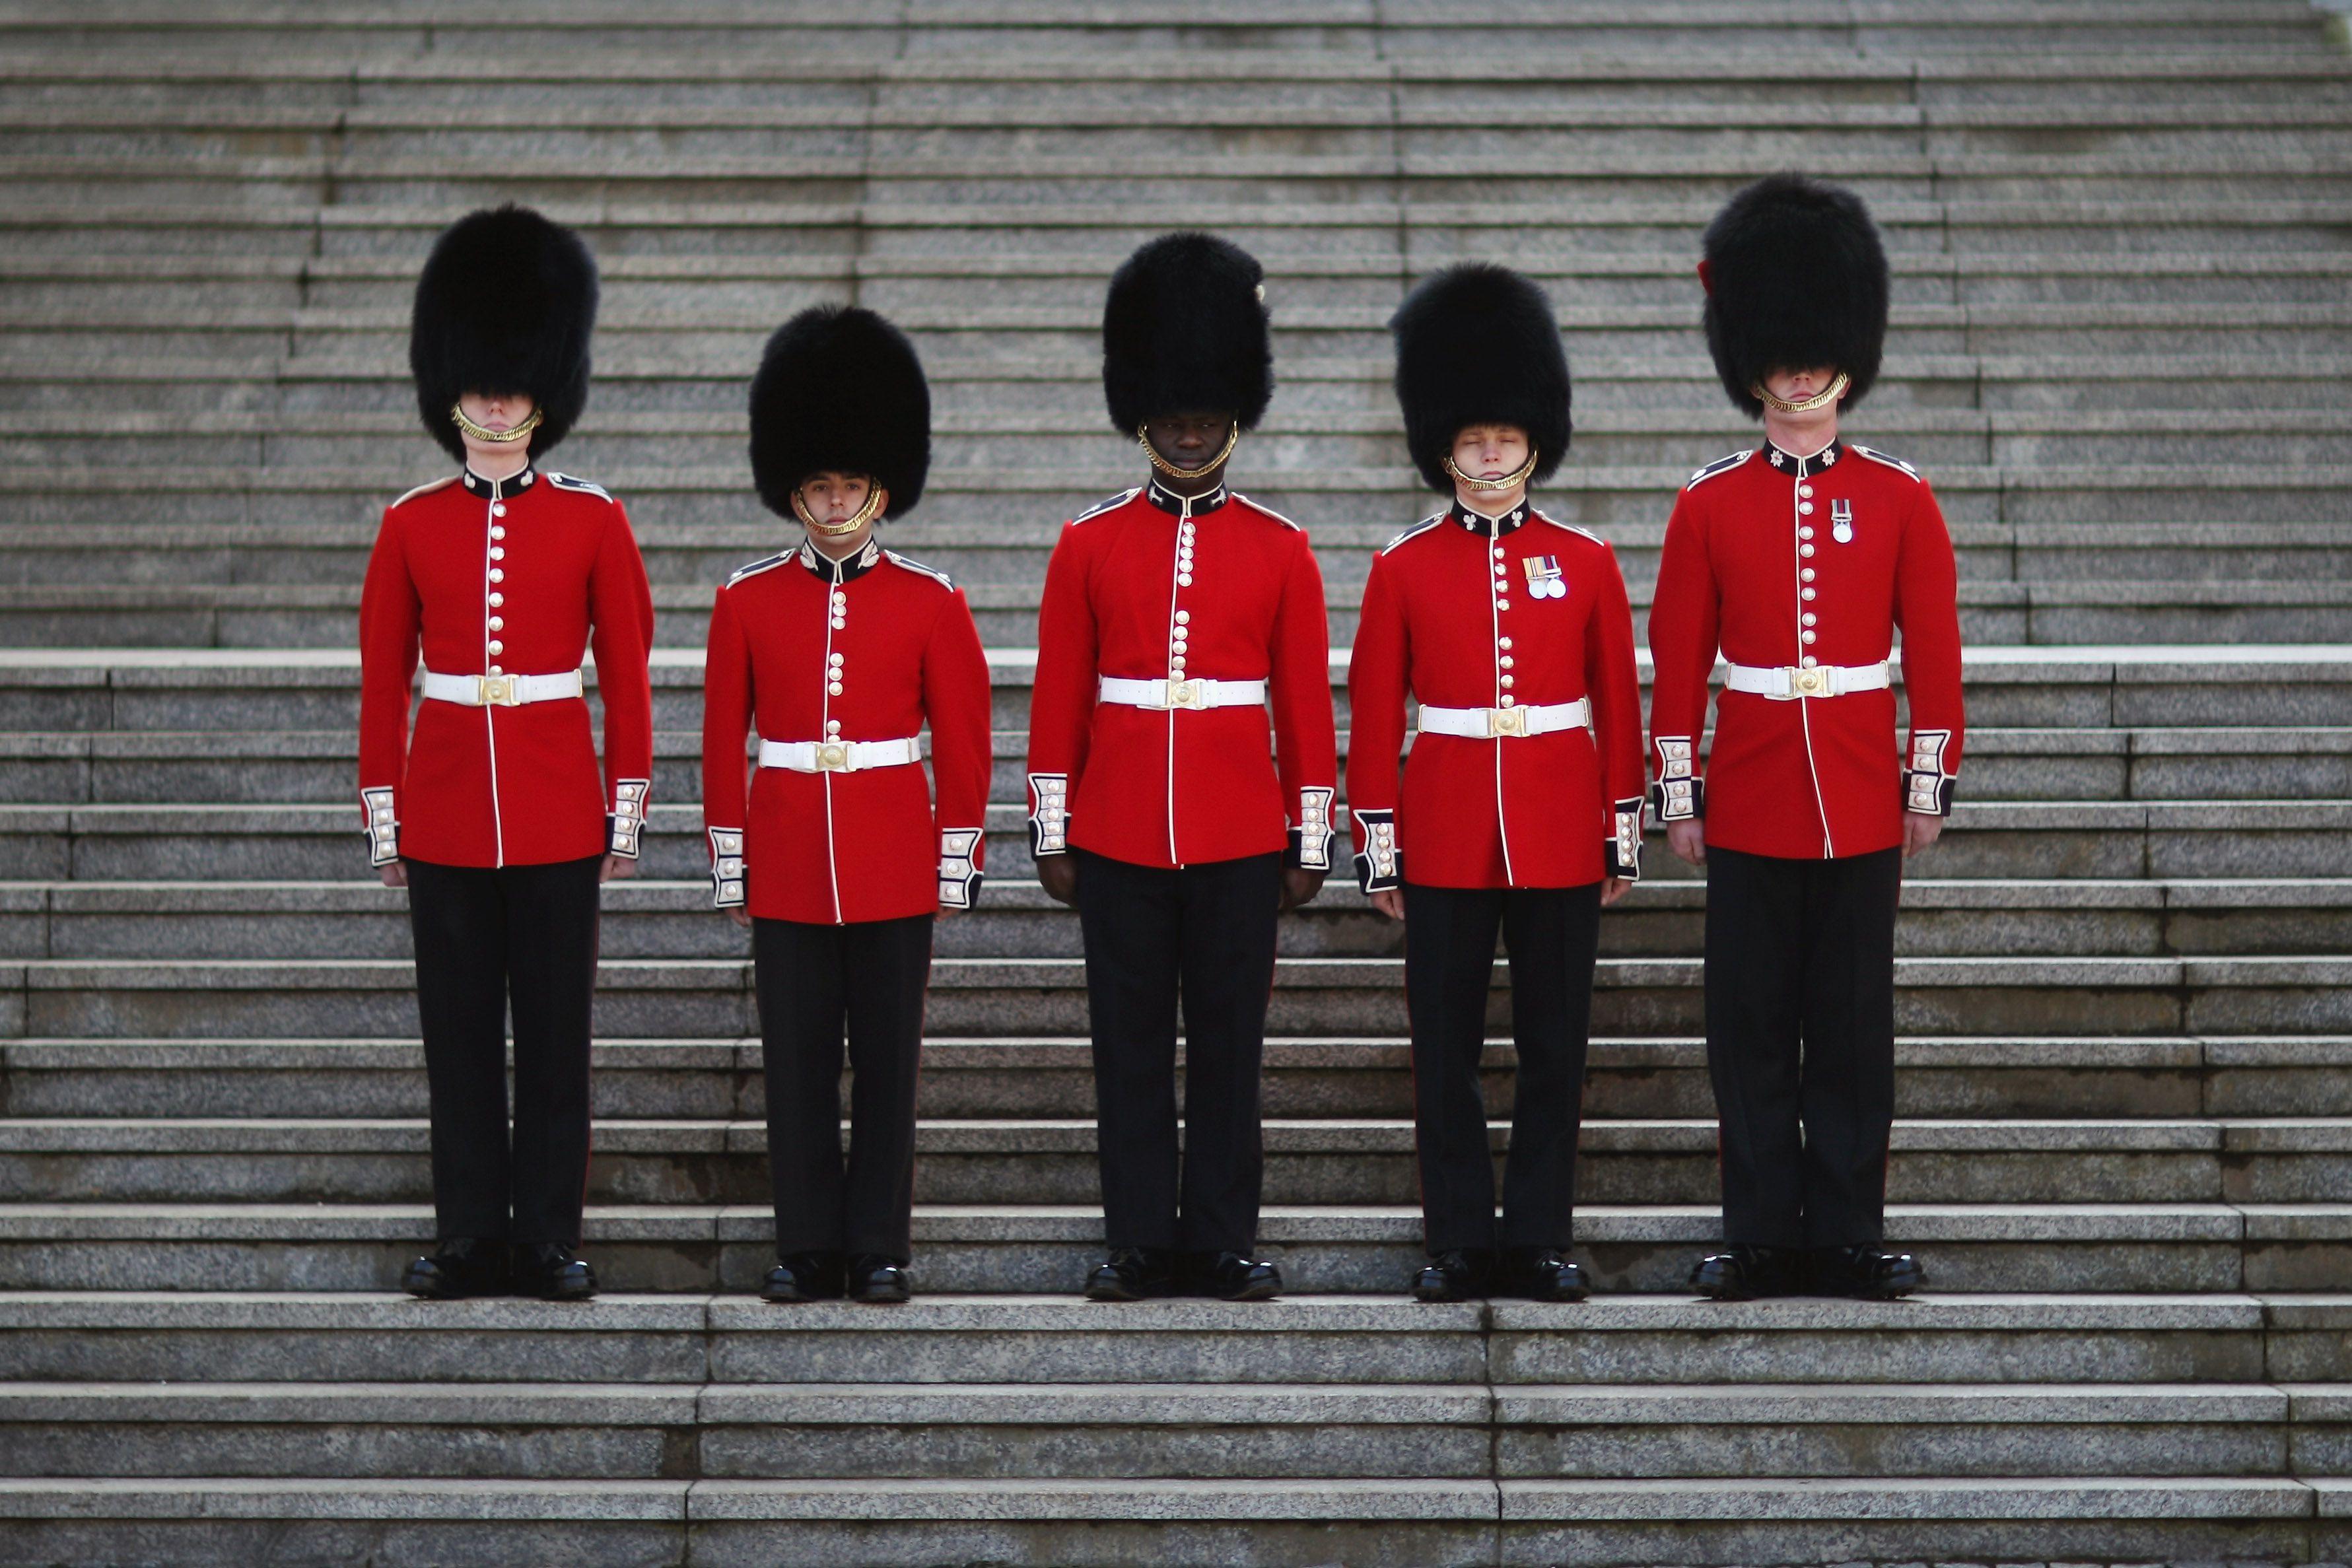 Foot Guards 42